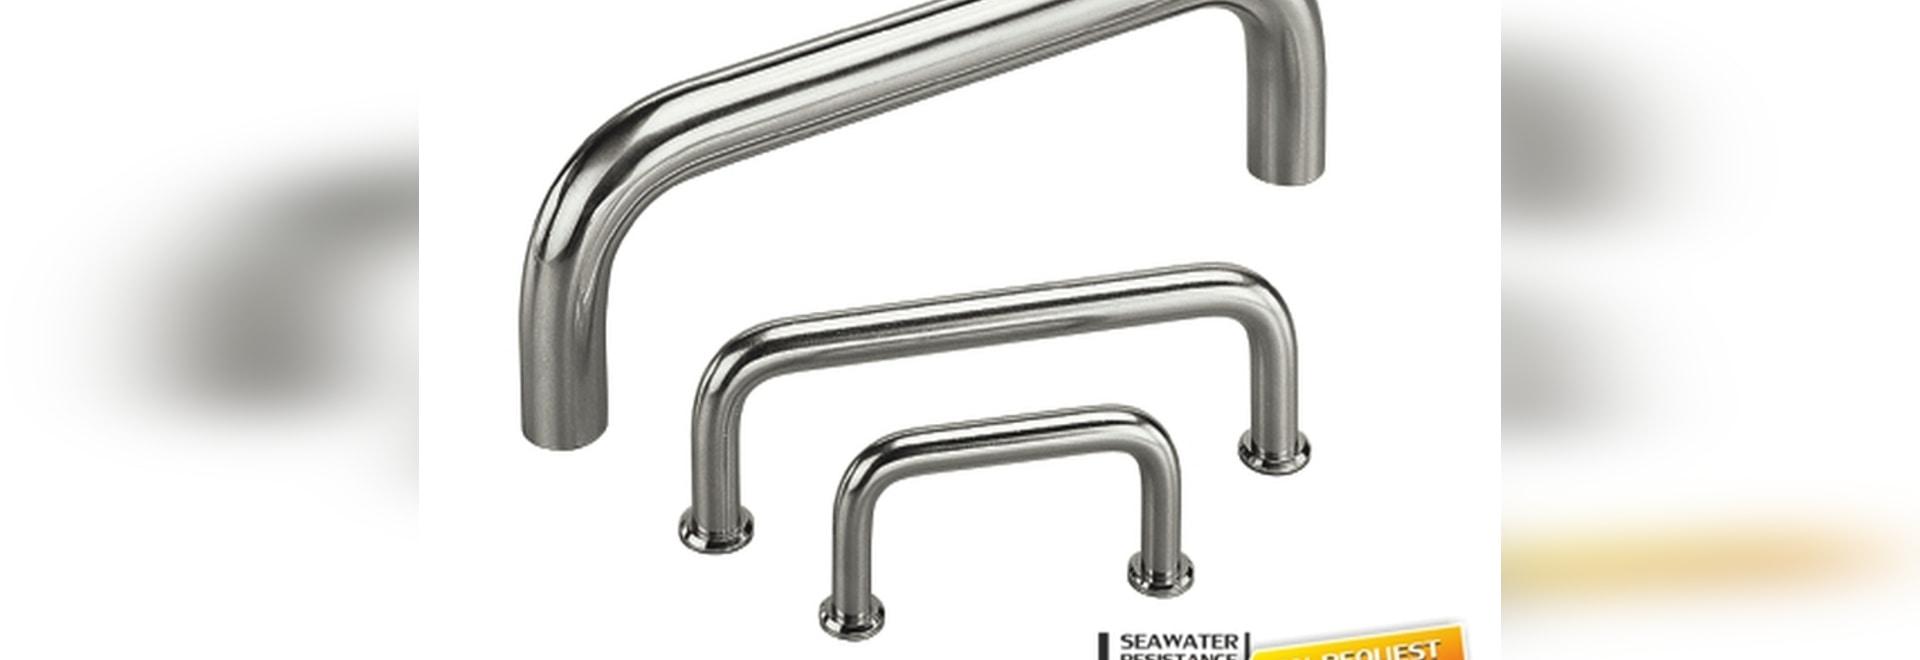 Stainless Steel Handle Series VA